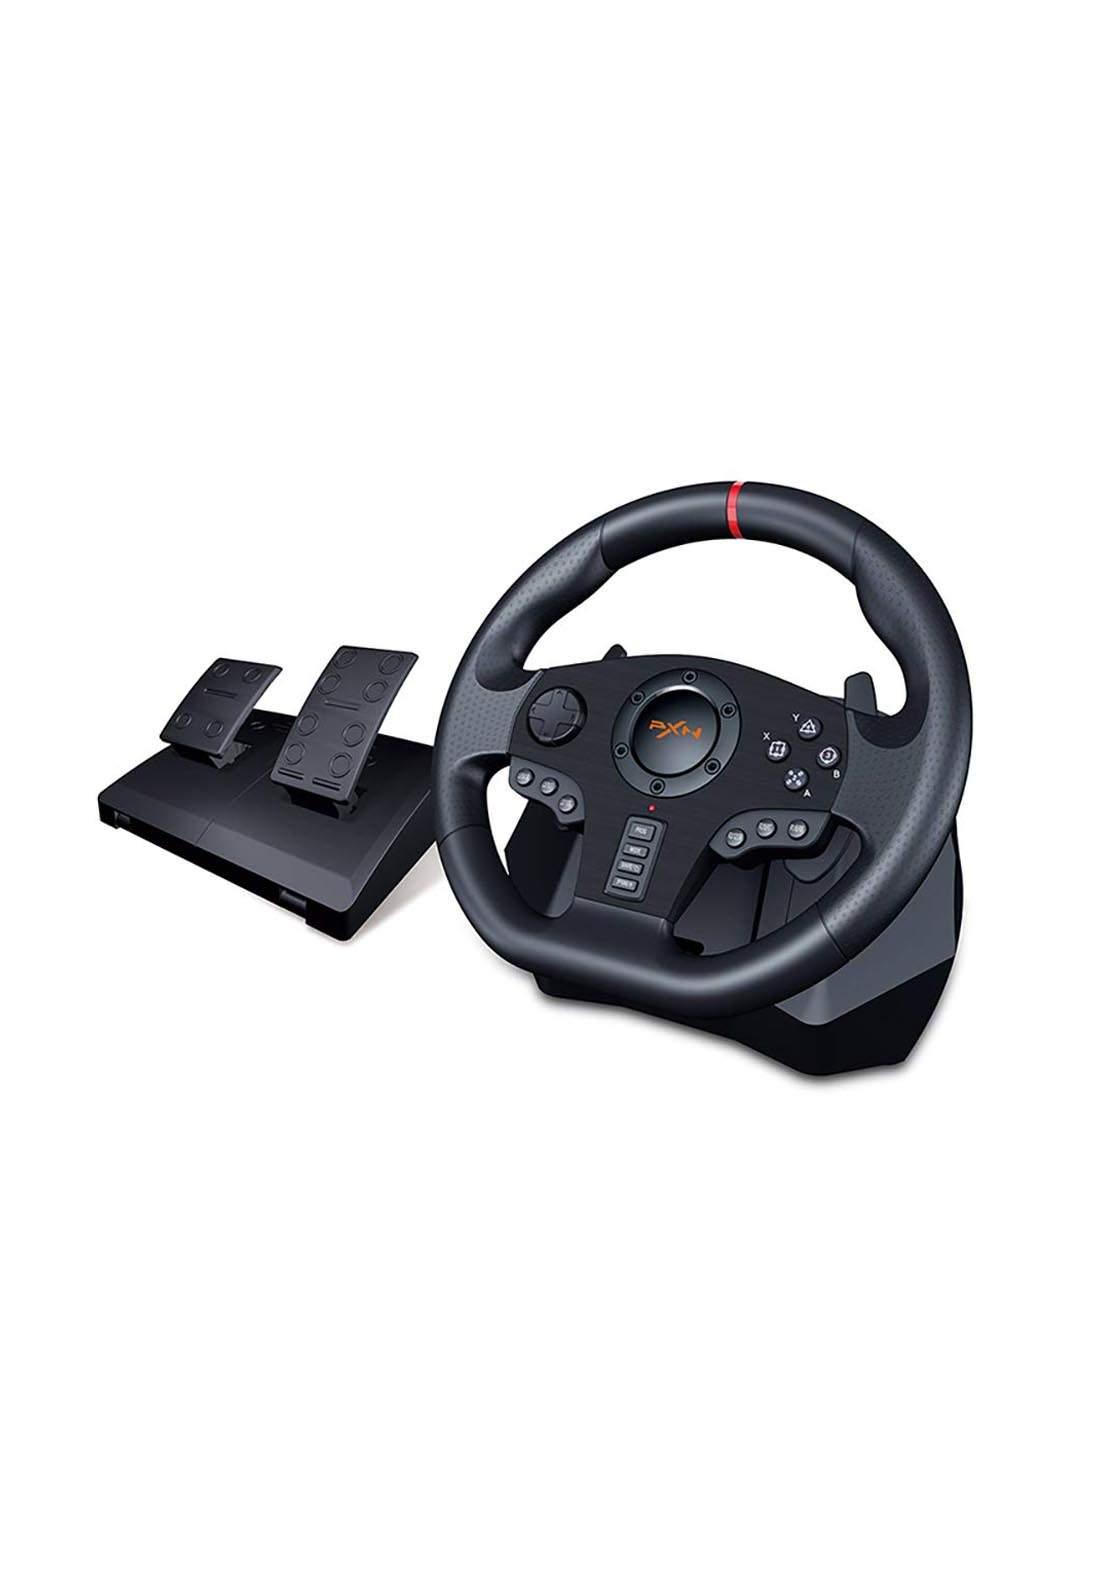 PXN V900  Gaming Racing Steering Wheel with Brake Pedal - Black عجلة قيادة ودواسة العاب